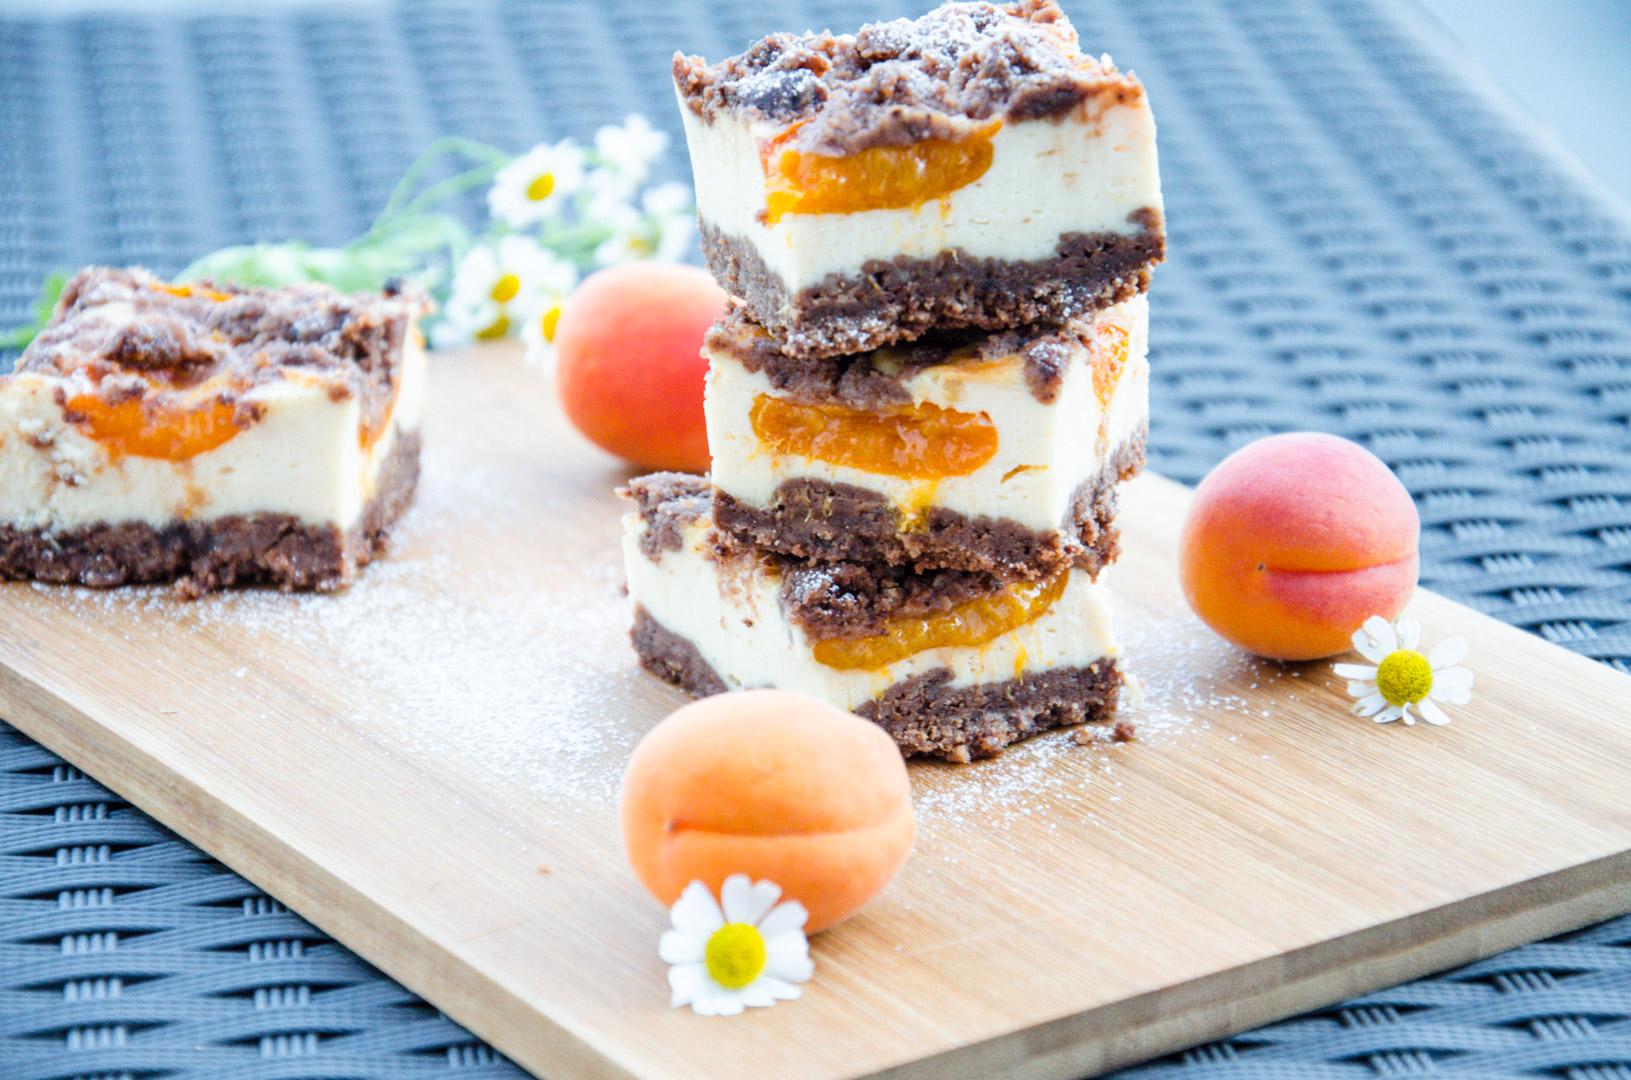 Schokolade Marillen Streuselkuchen Aprikosen Baking Barbarine